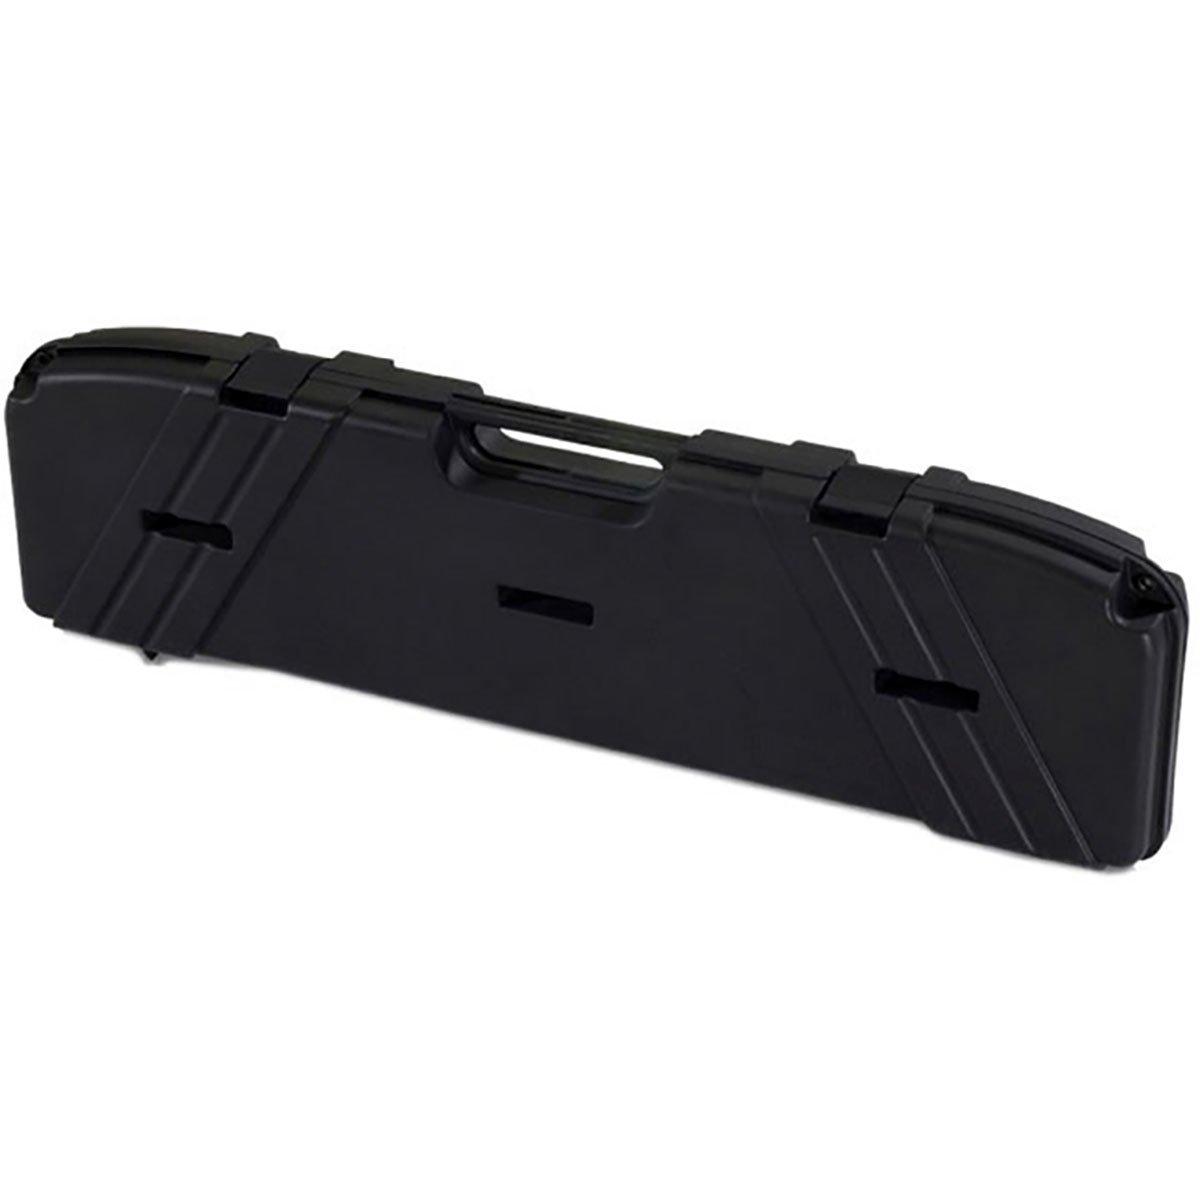 Plano Bow-Max Arrow Case Plano Molding 1118-00